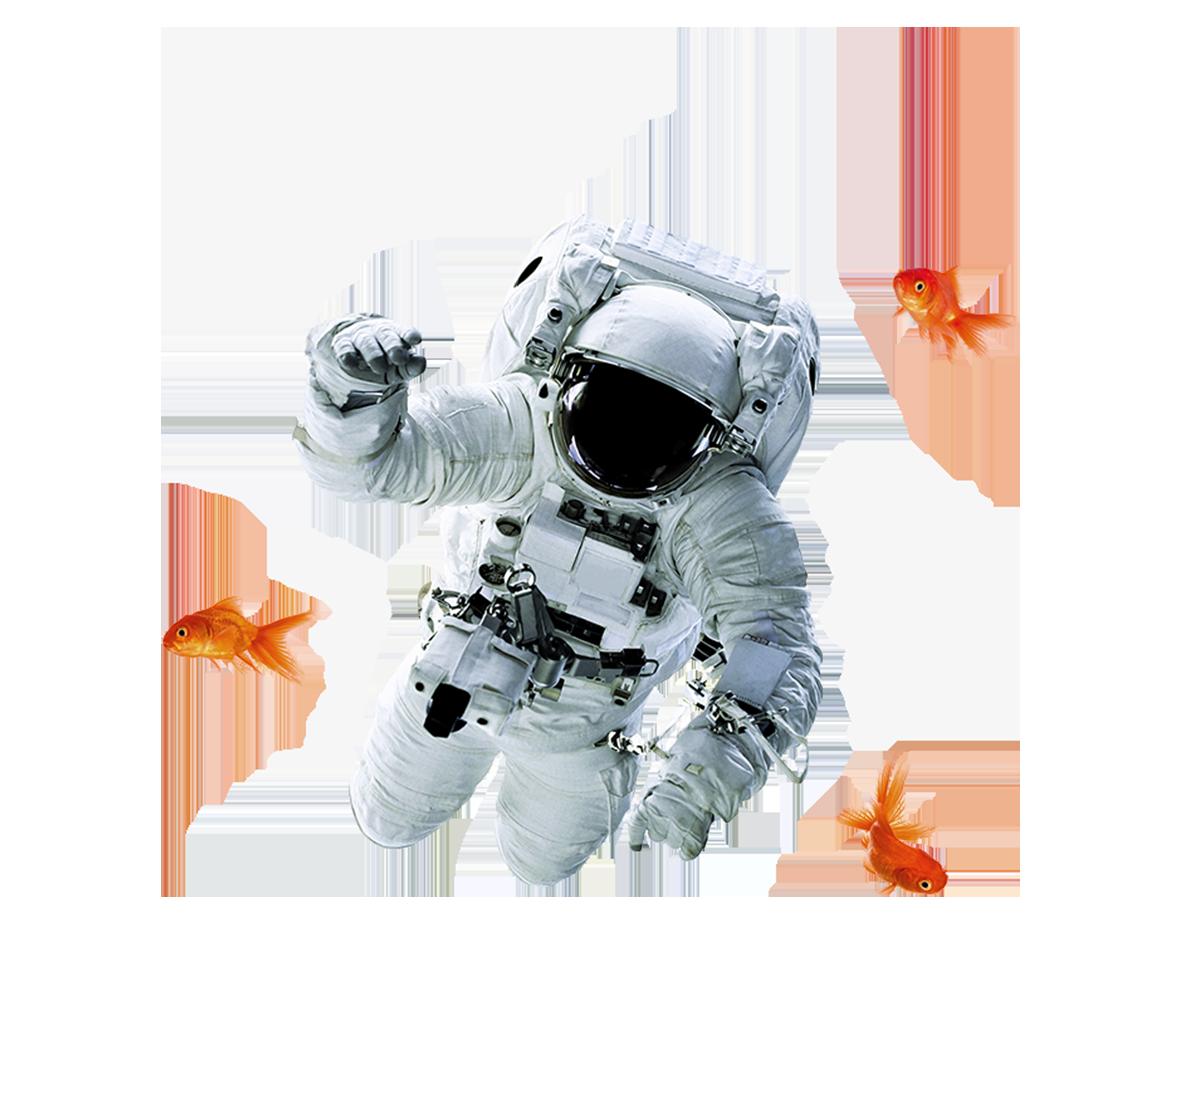 VIOOH_Hero_Astonaught-Fish